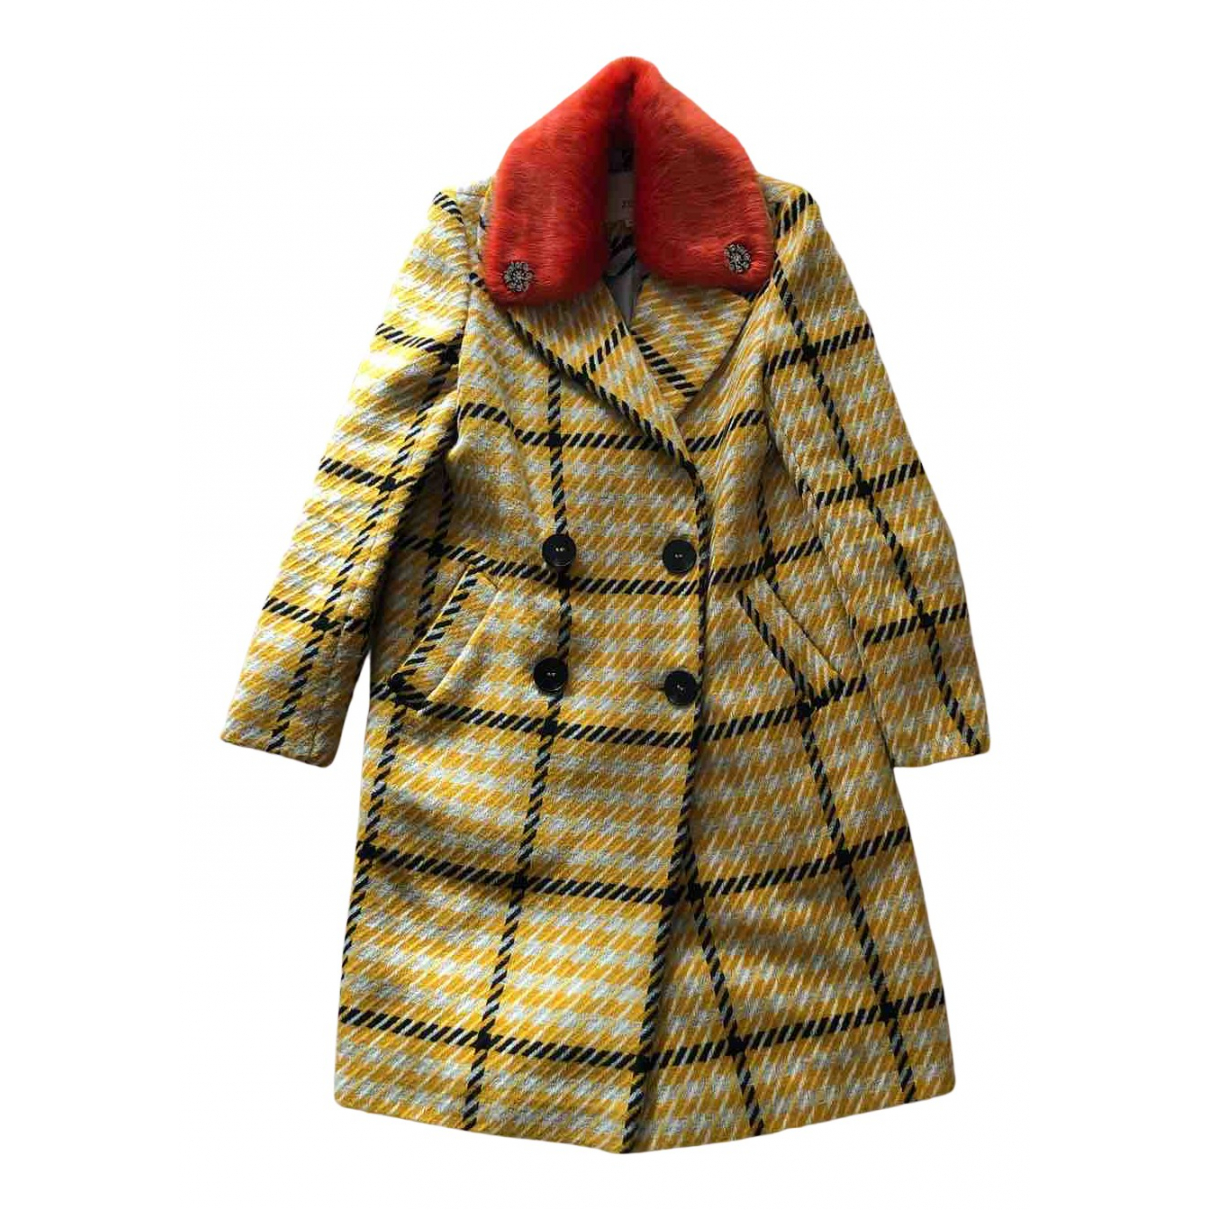 River Island N Yellow coat for Women 8 UK